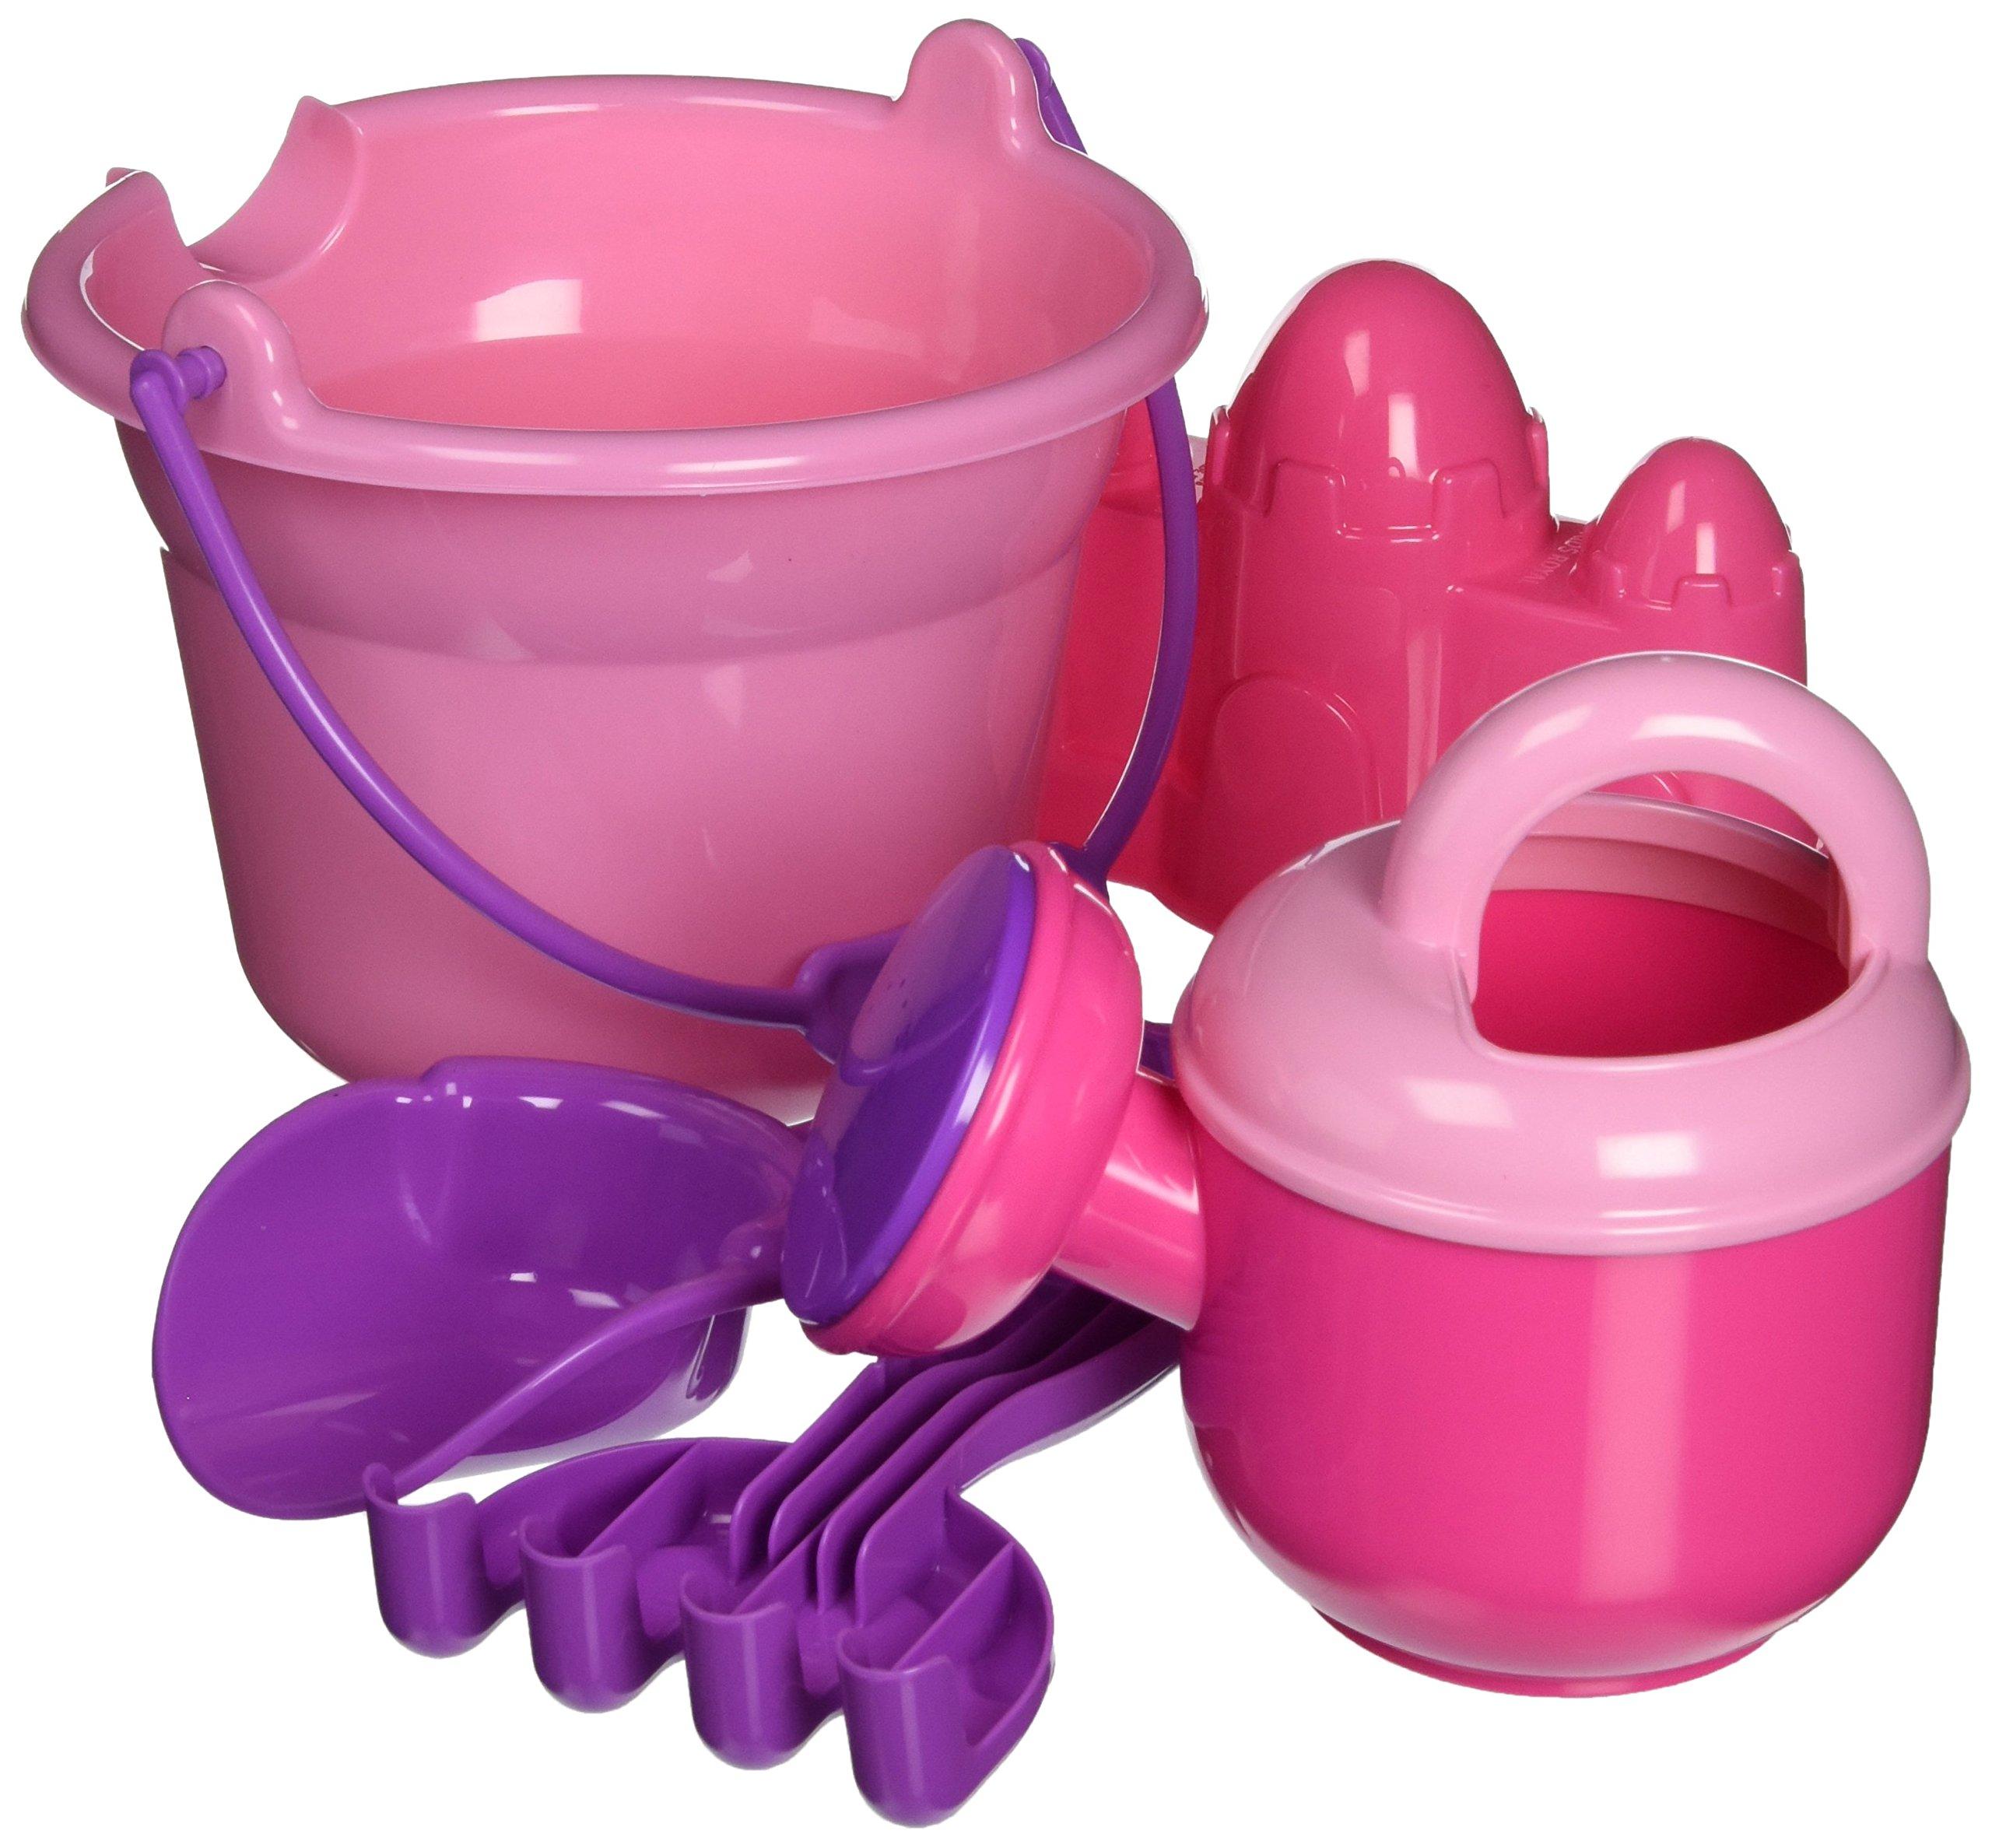 Small World Toys 5 pieces Princess bucket set